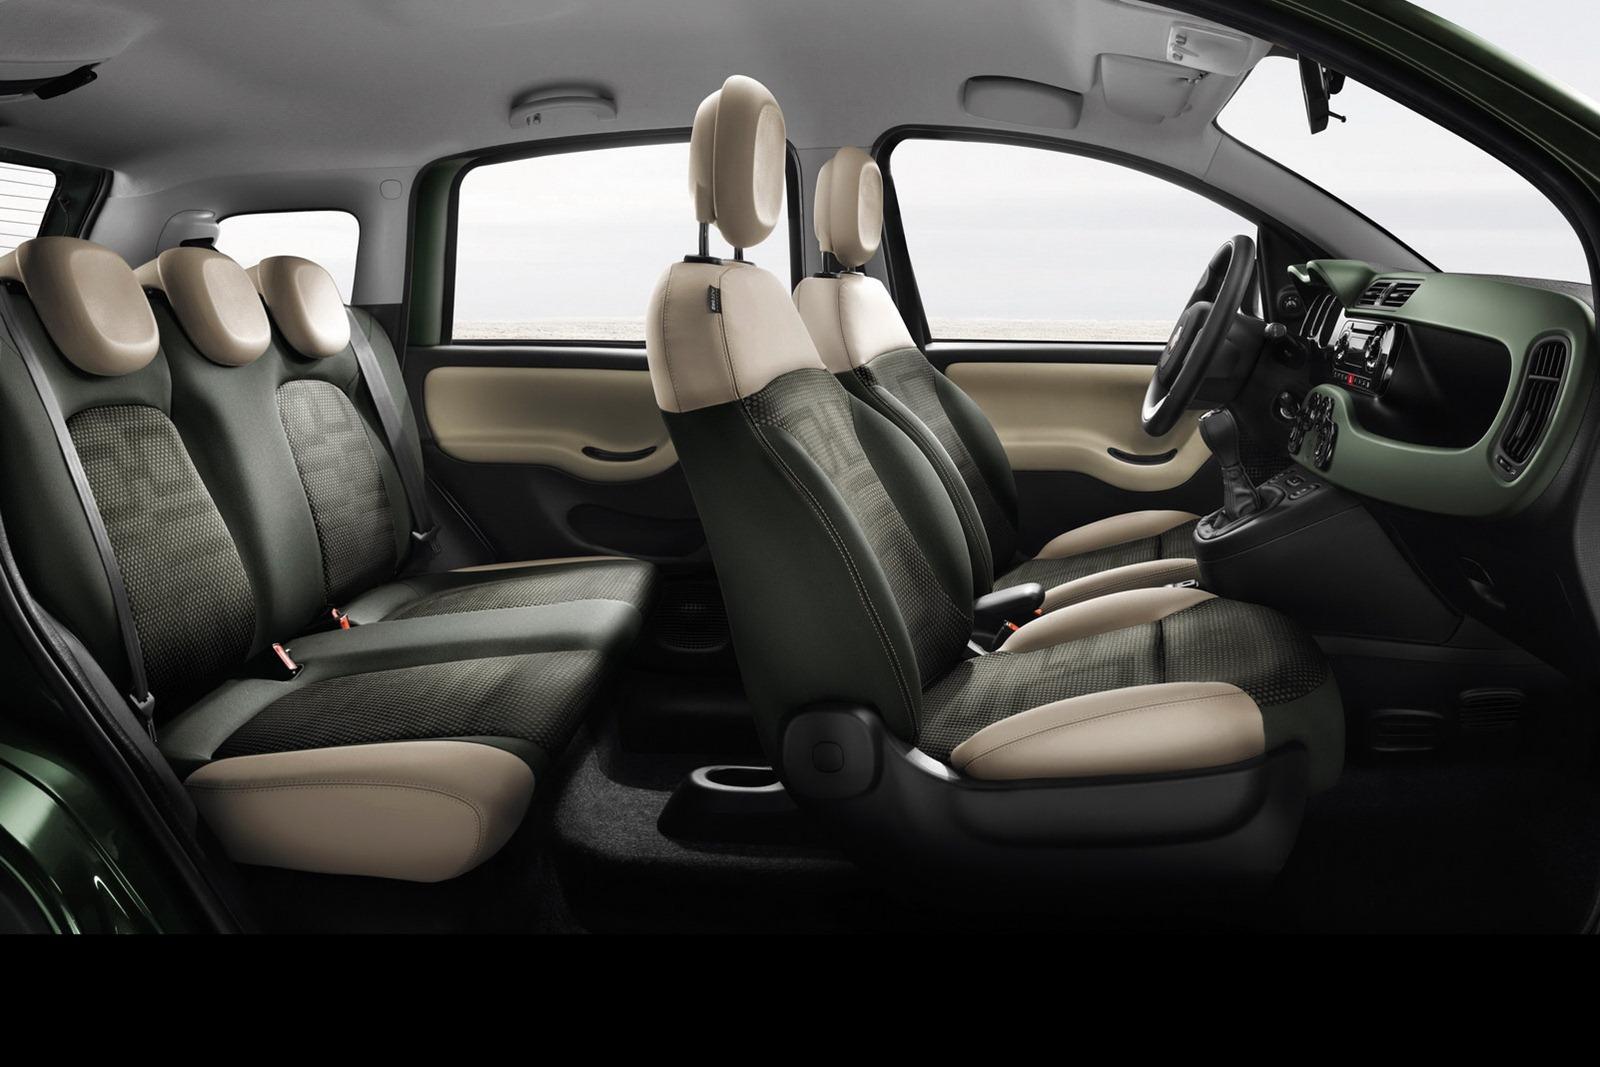 2013-Fiat-Panda-4x4-1.jpg